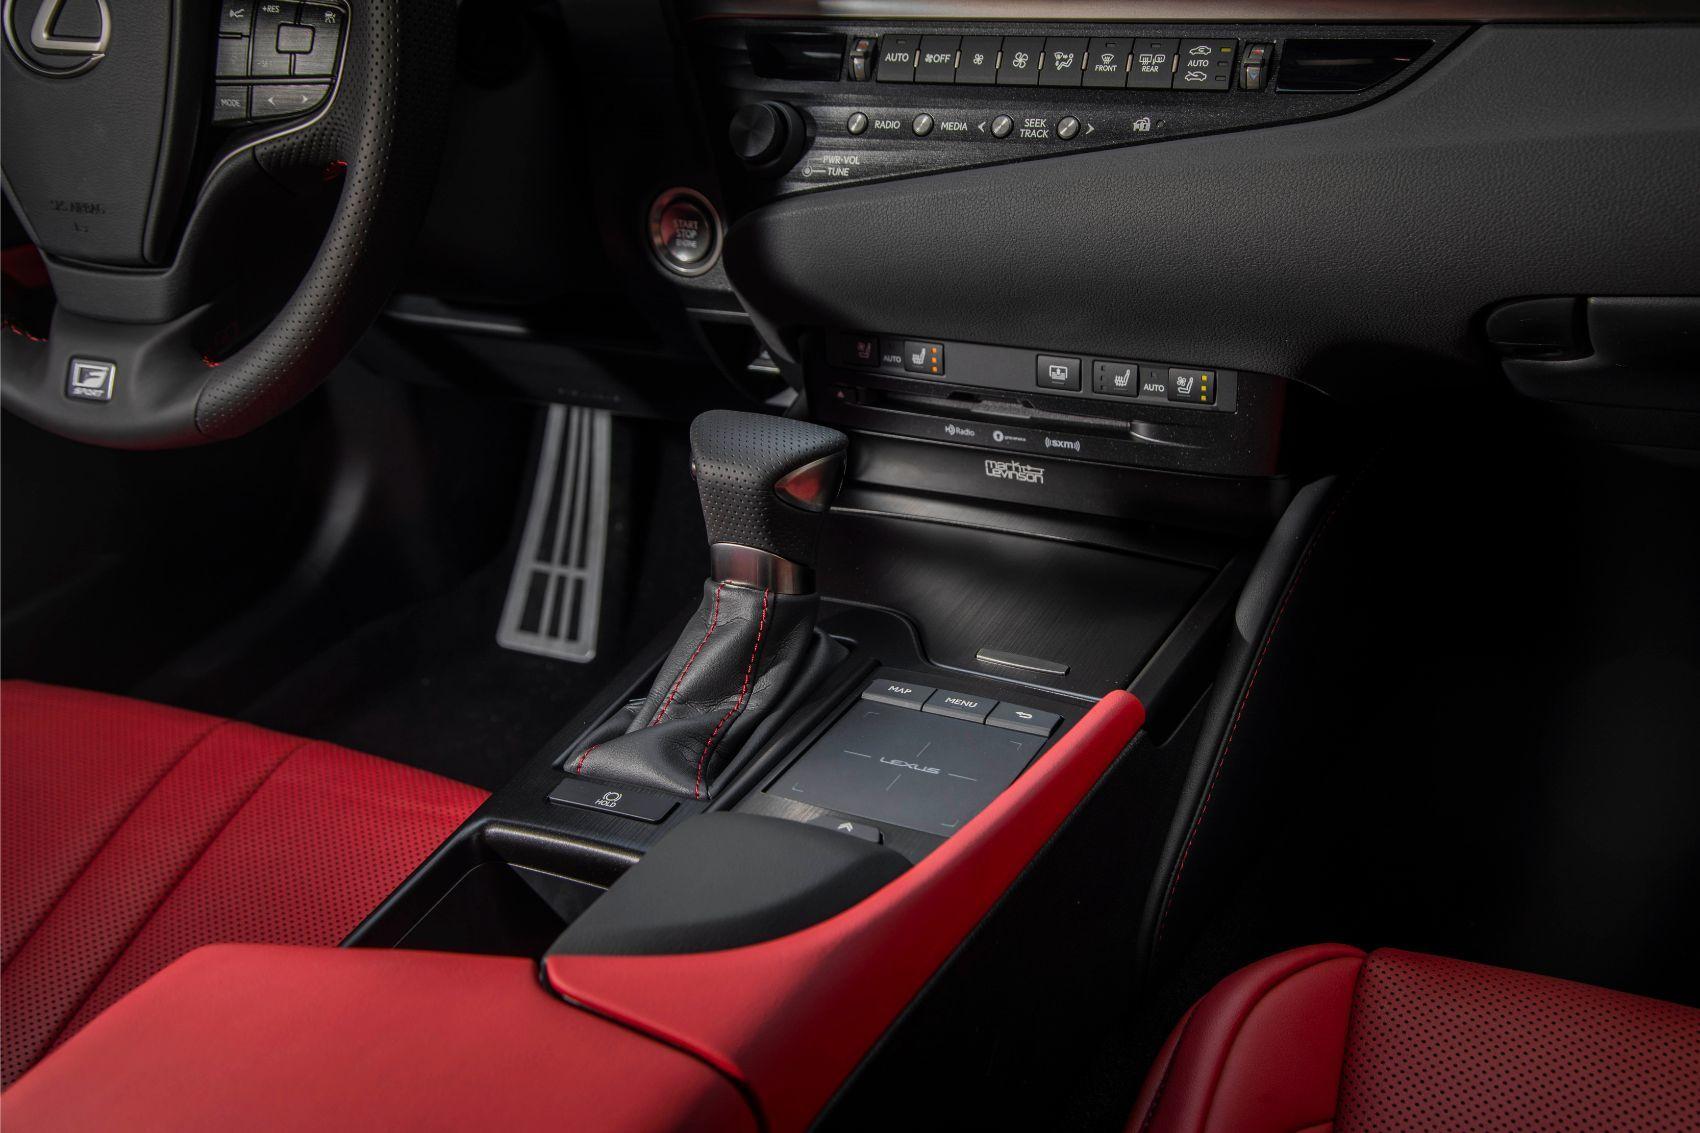 2020 Lexus ES 350 touchpad interface.